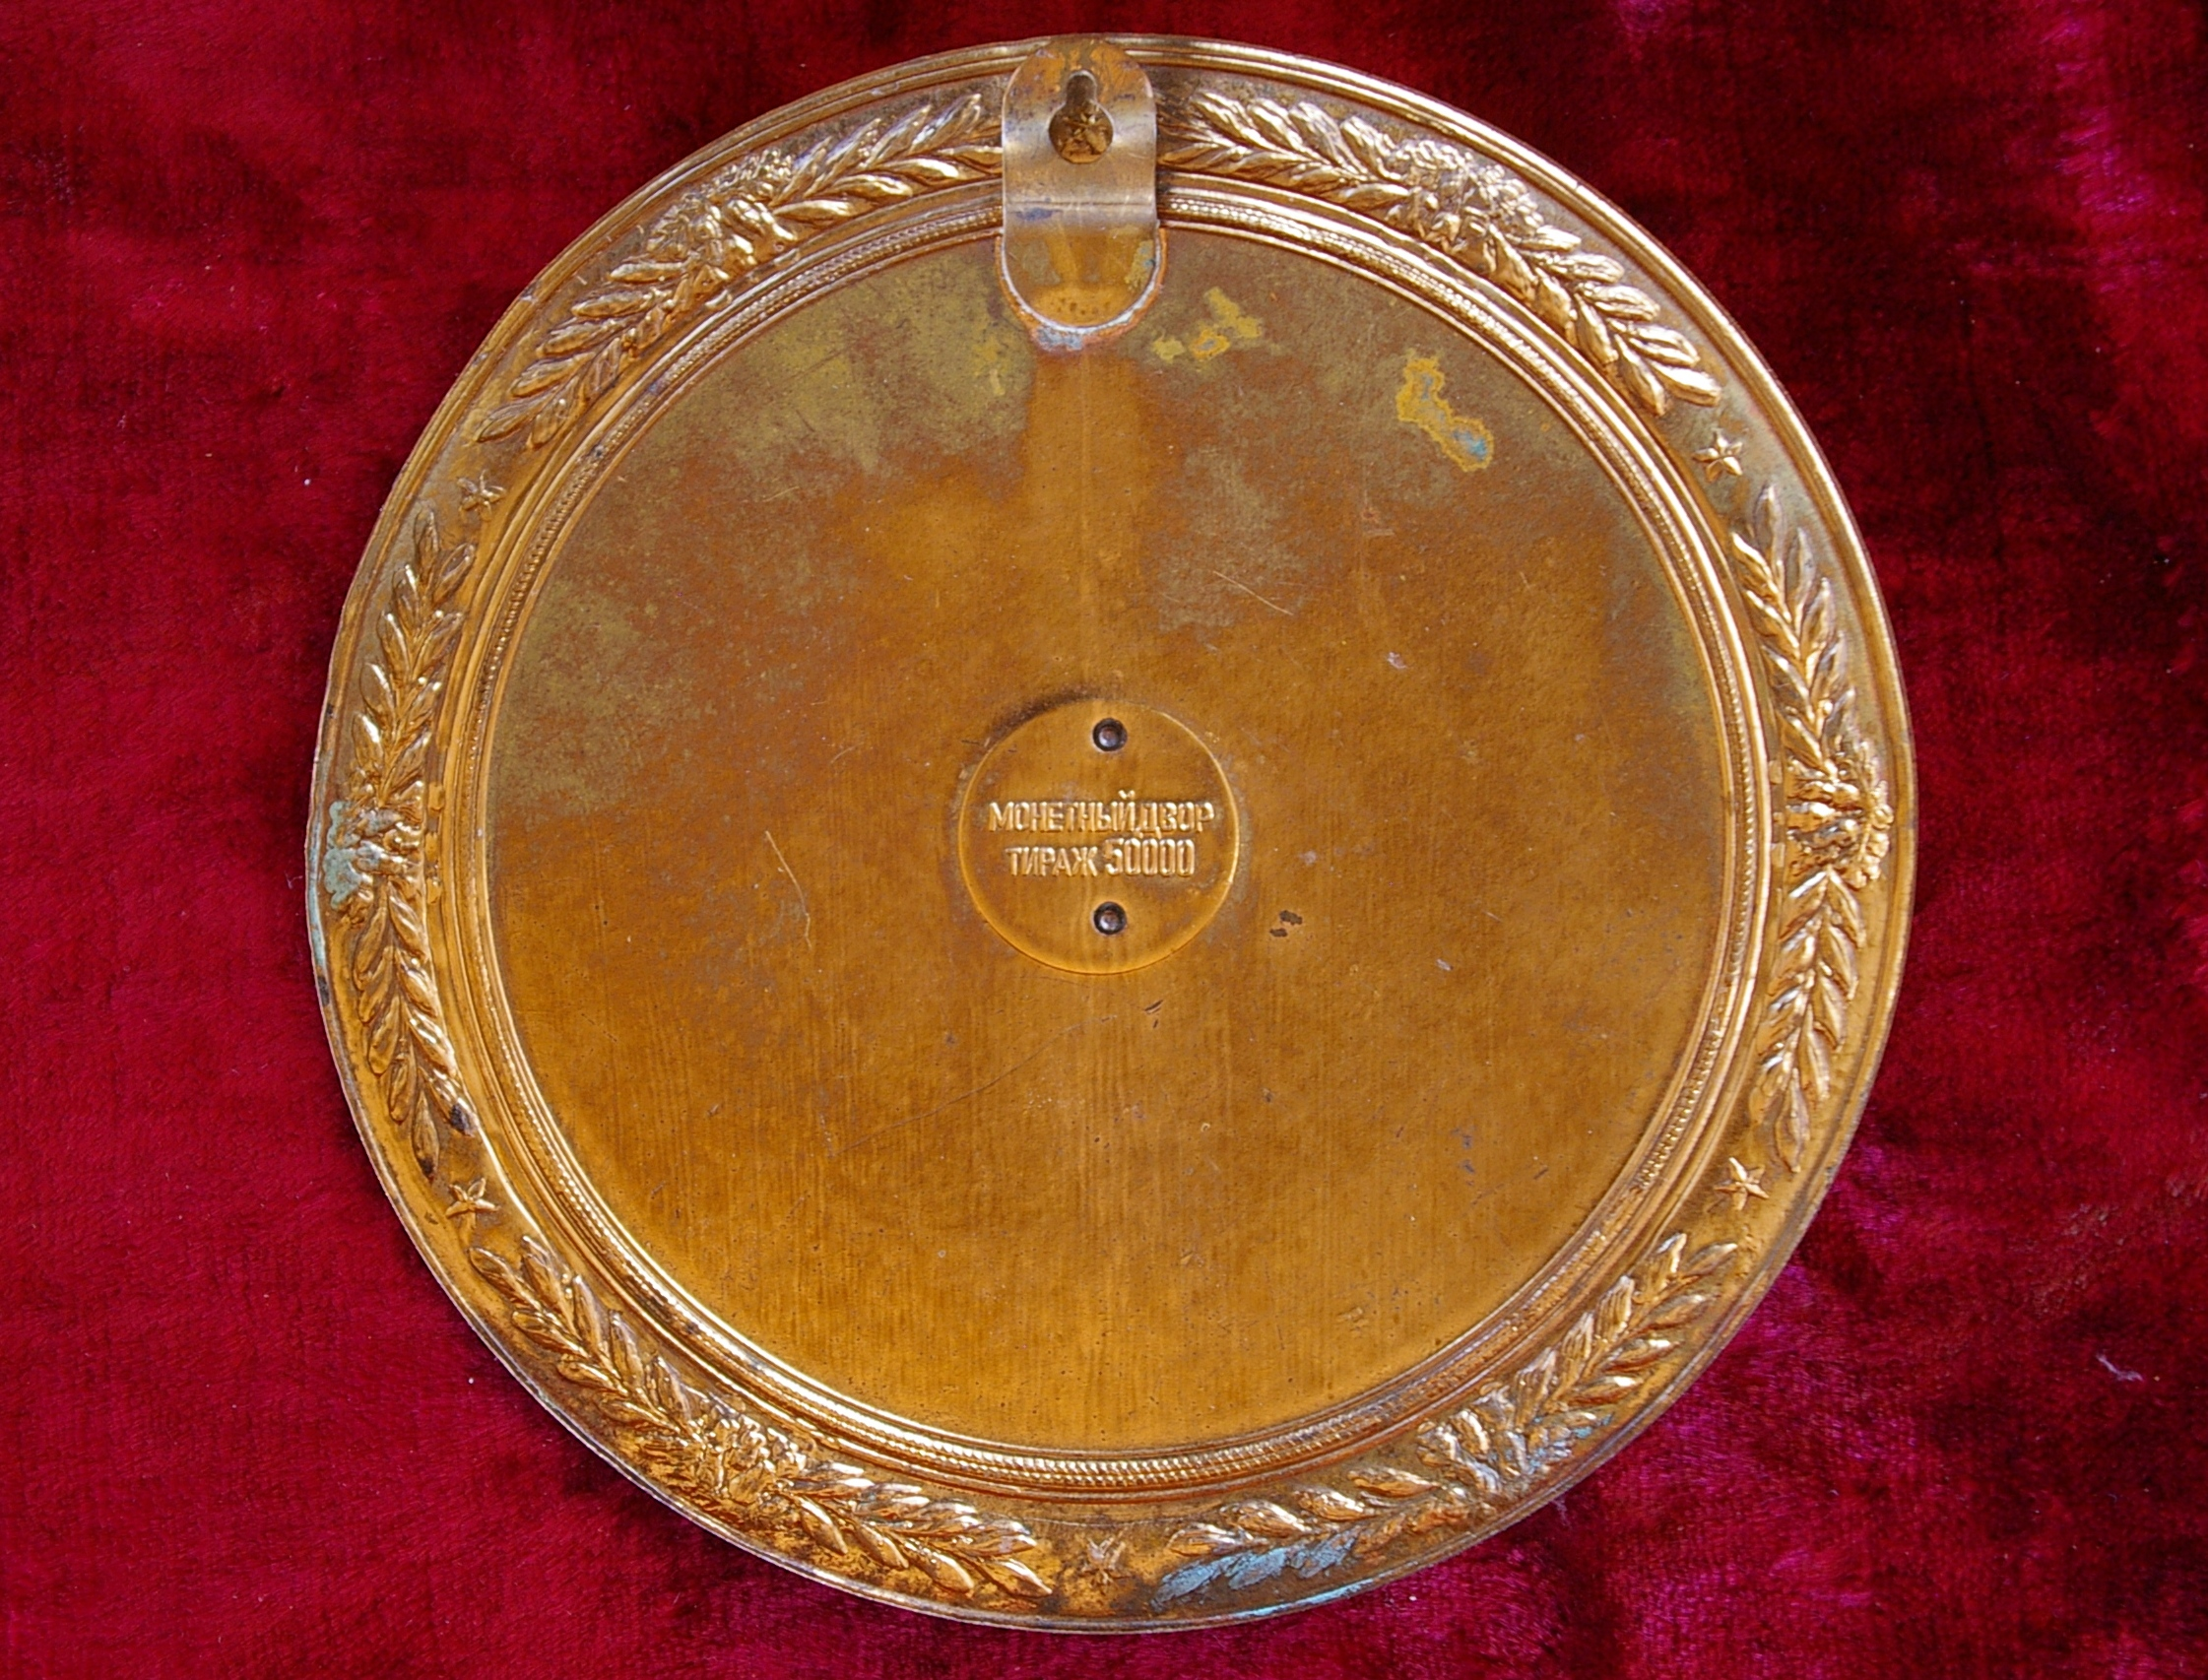 Медаль Ленин, материал фарфор, ширина 12 см. - 1